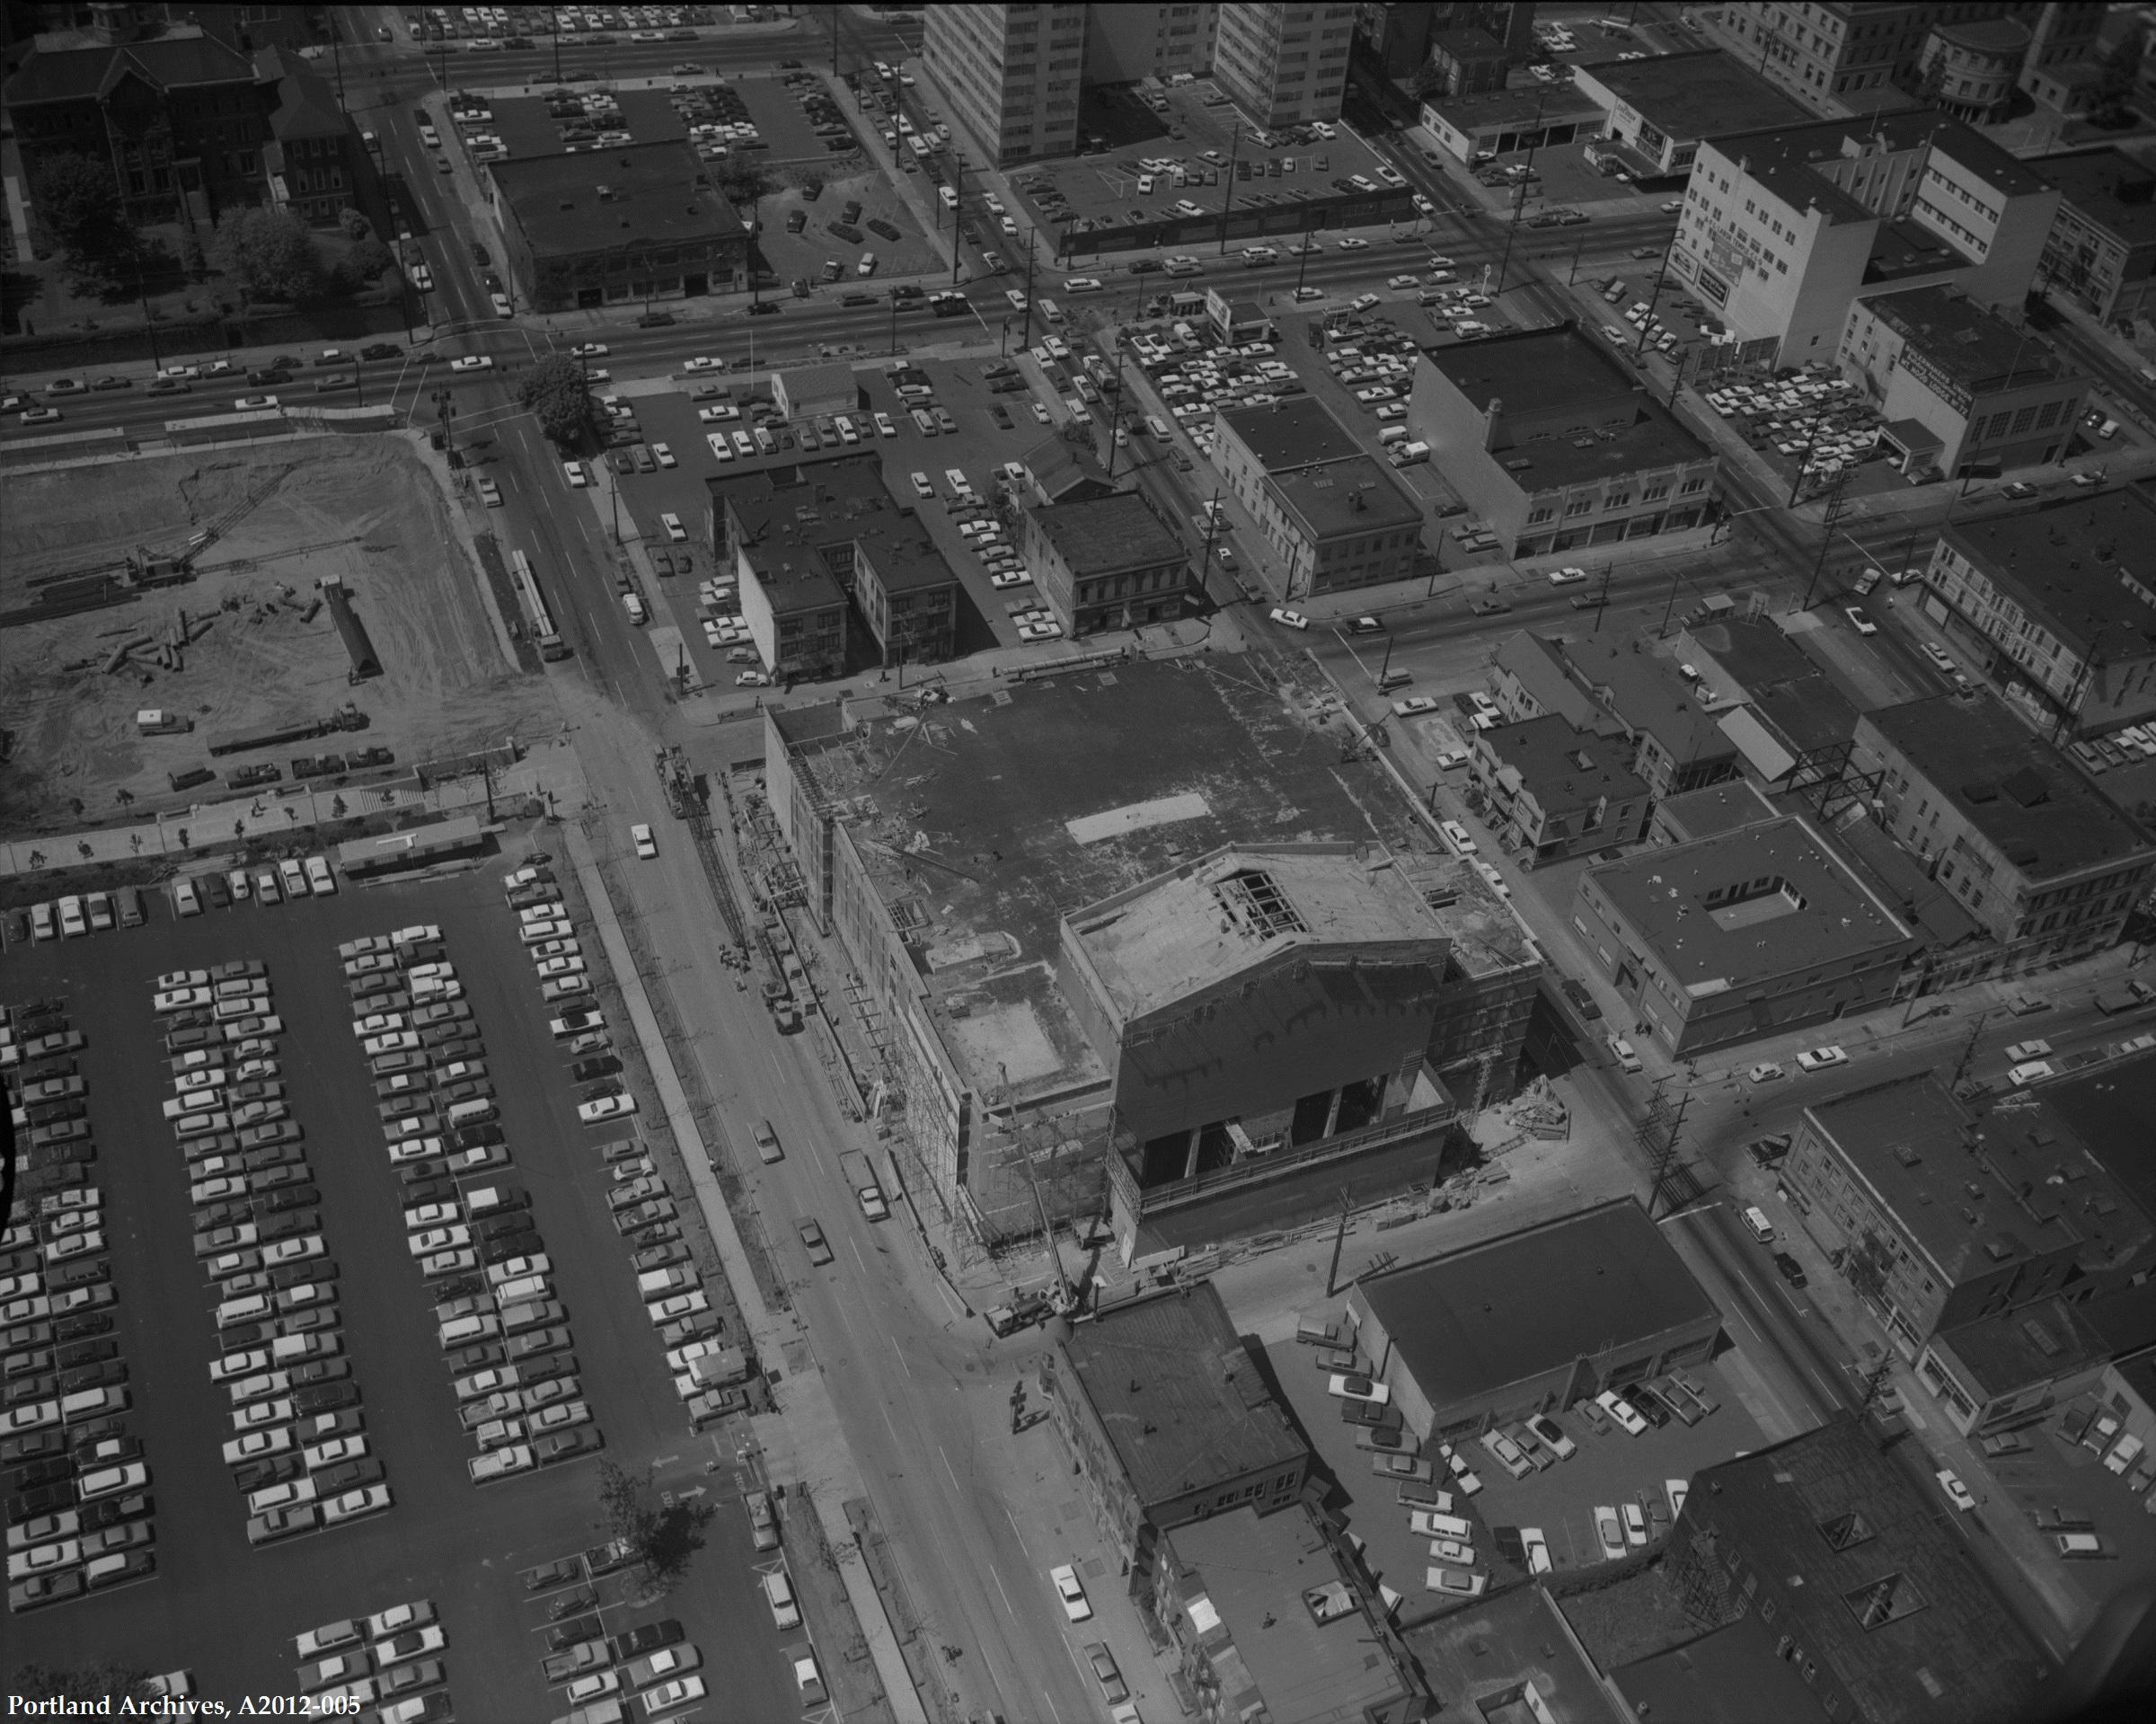 Civic Auditorium, May 8, 1967: A2012-005